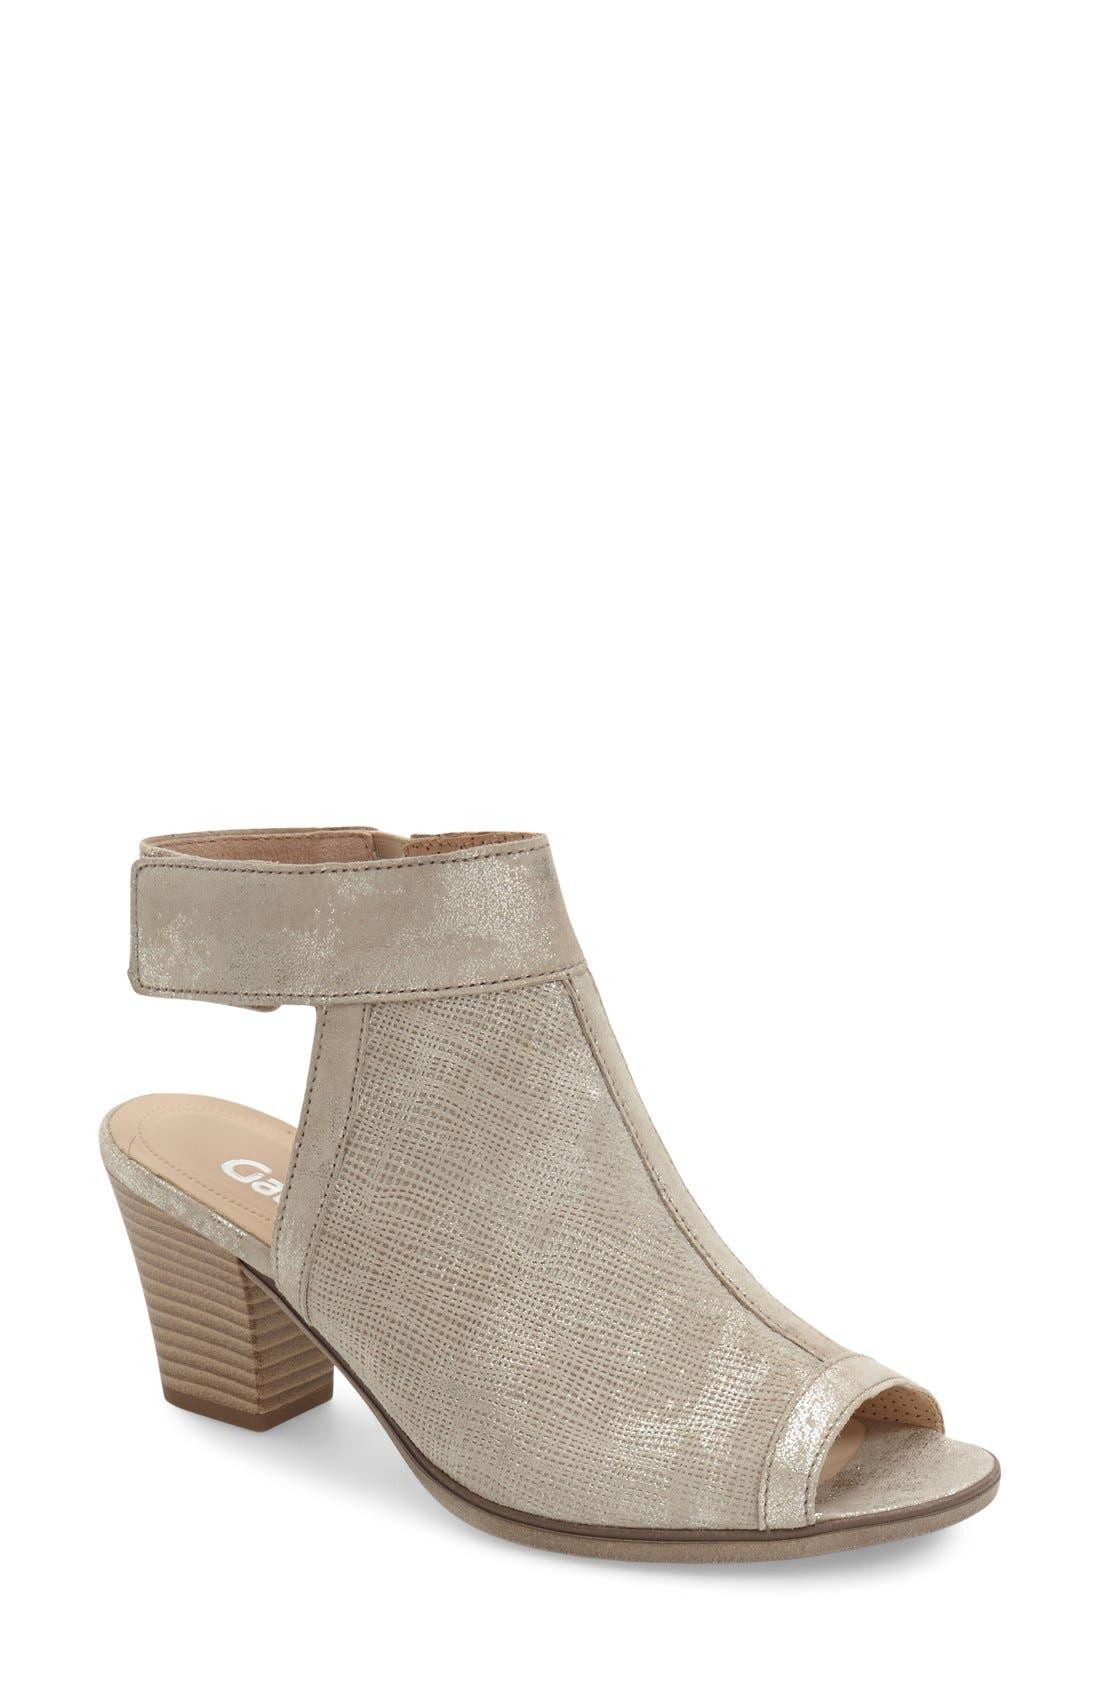 Alternate Image 1 Selected - Gabor Open Toe Leather Sandal (Women)